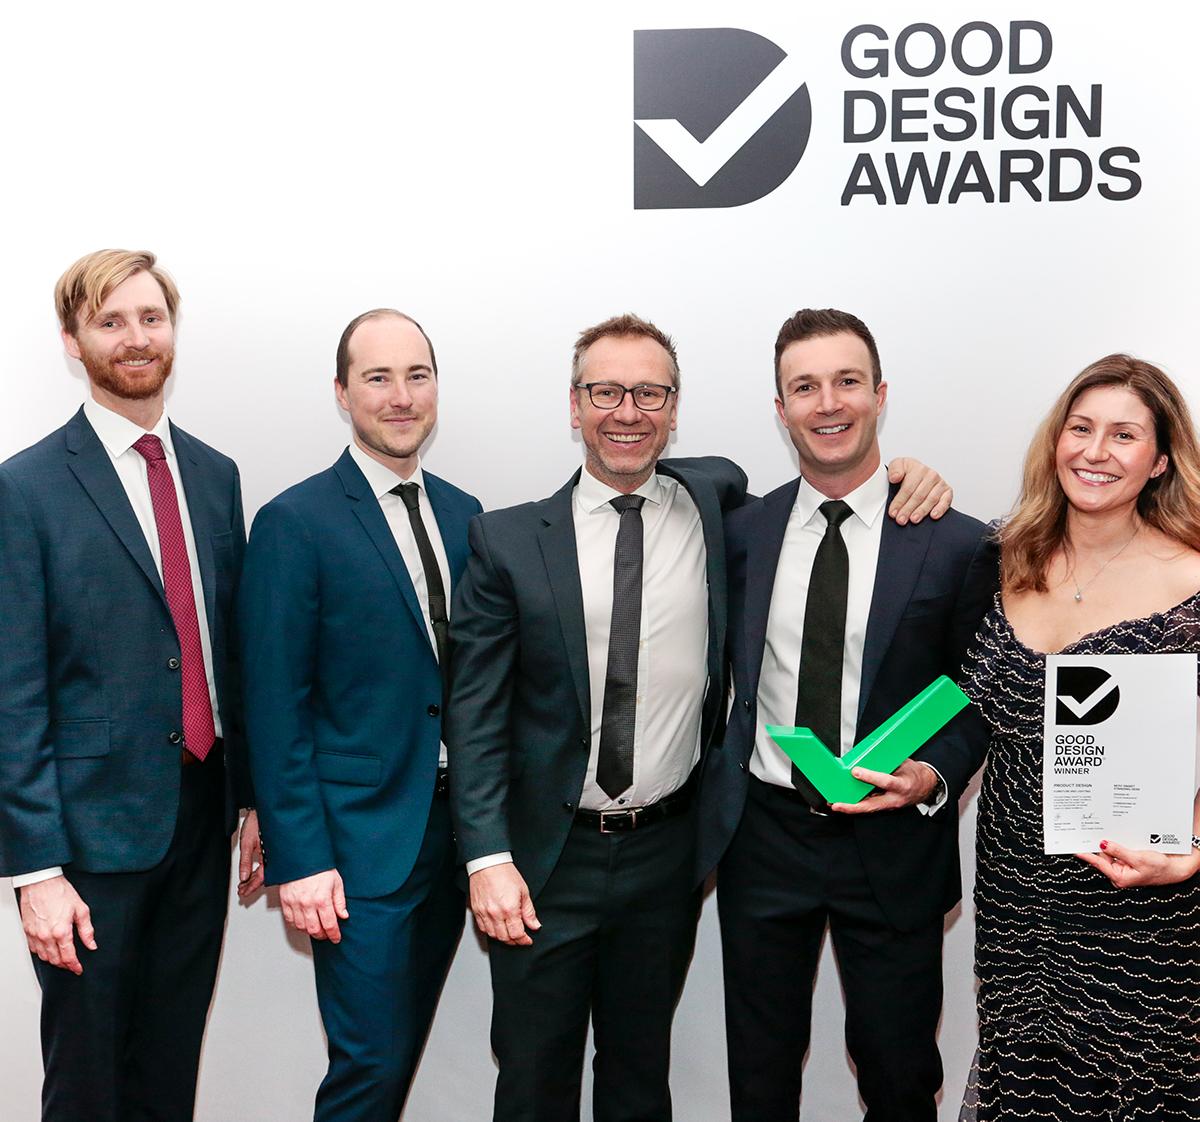 MOVI Good Design Awards